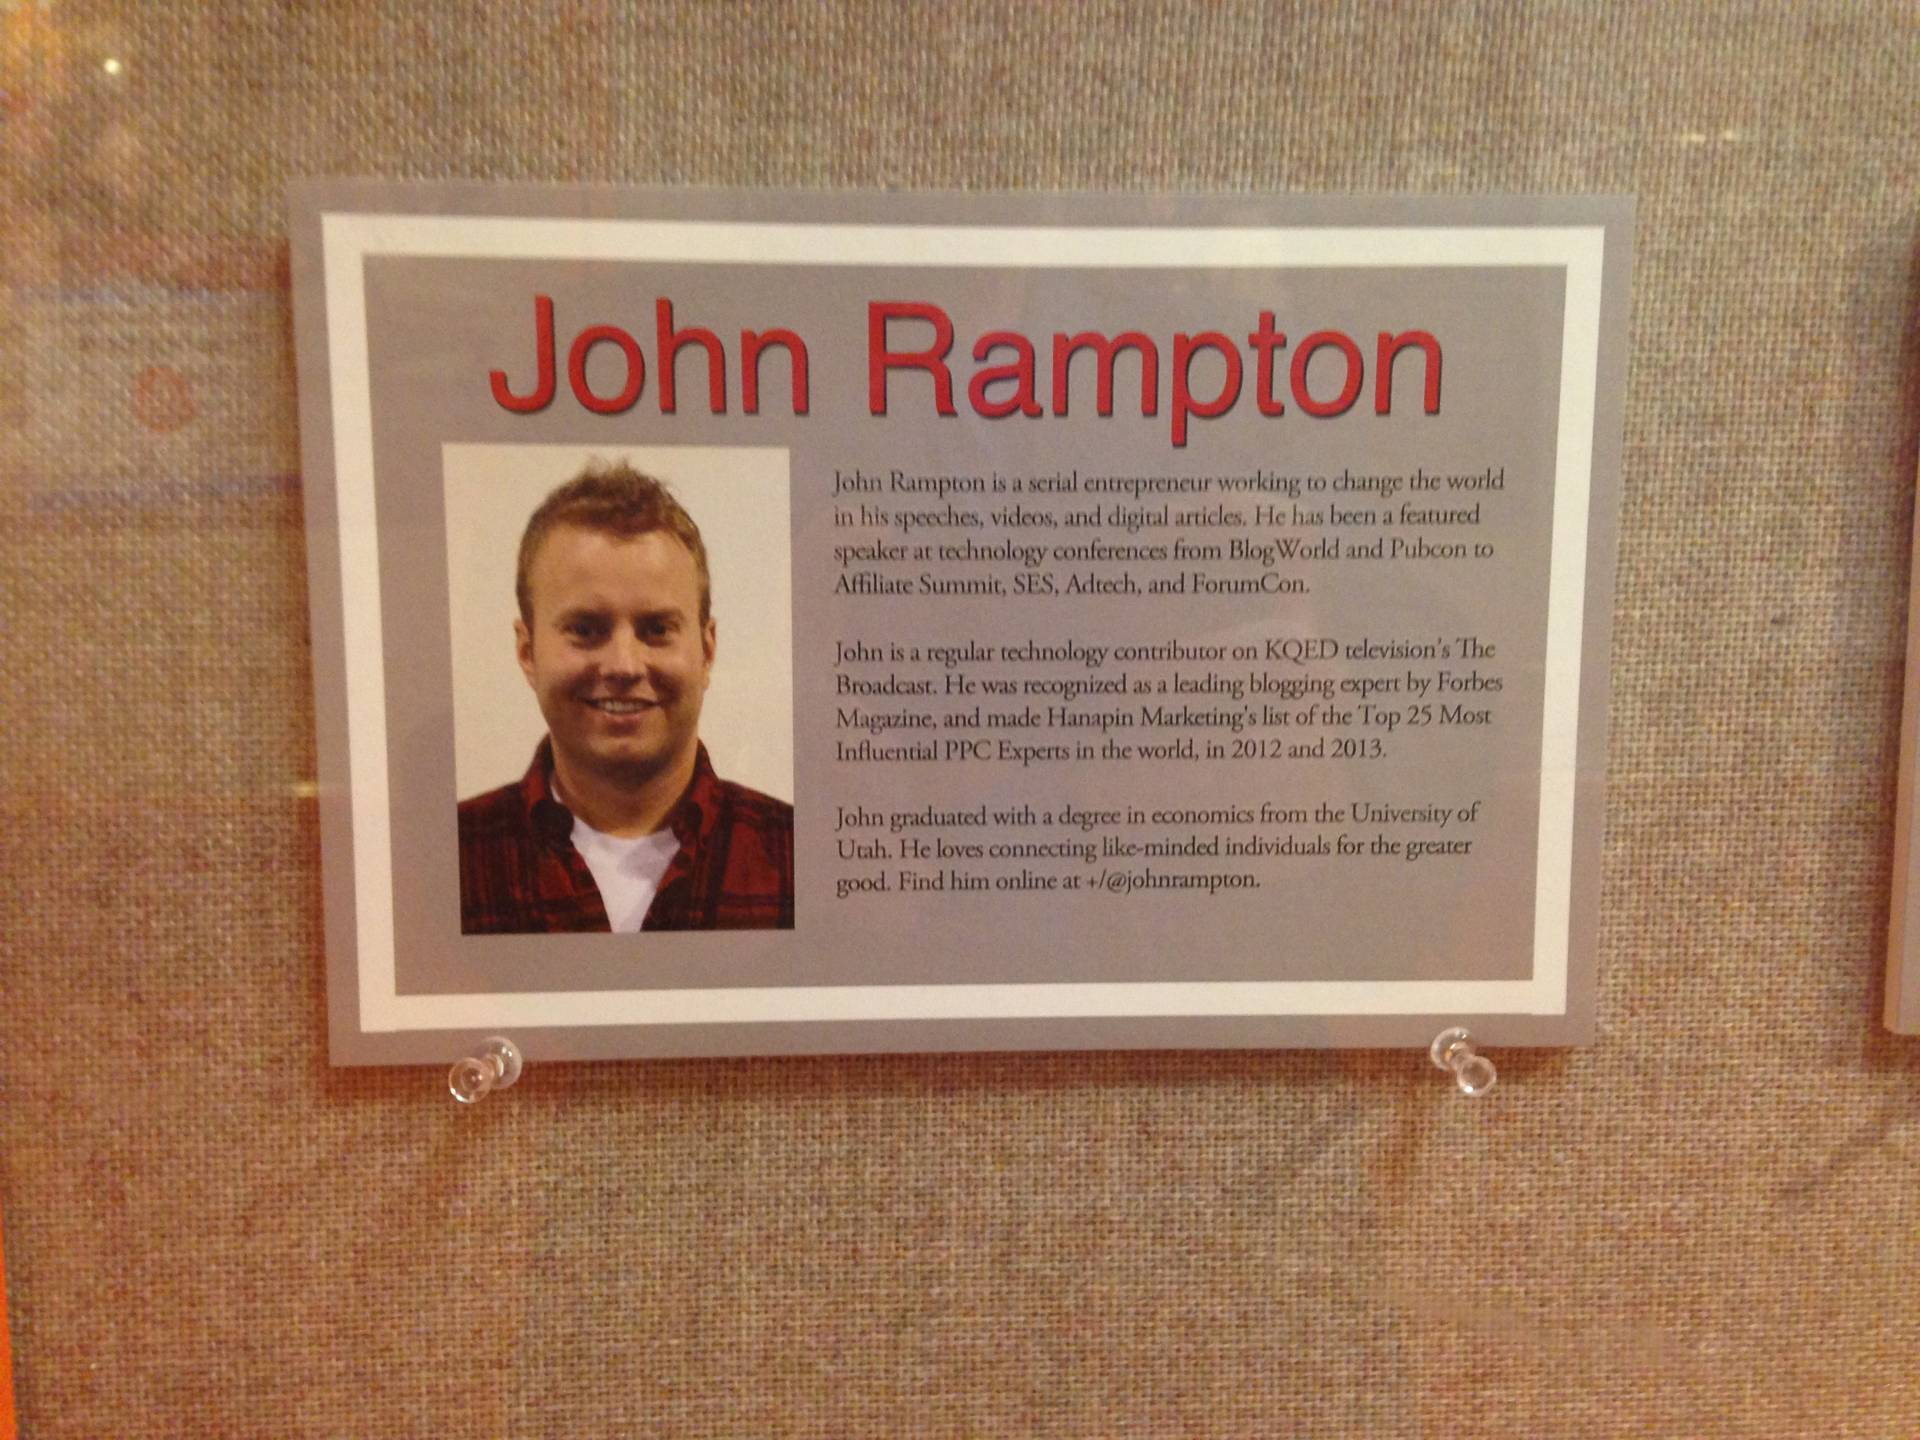 John Rampton at Academy of Art University